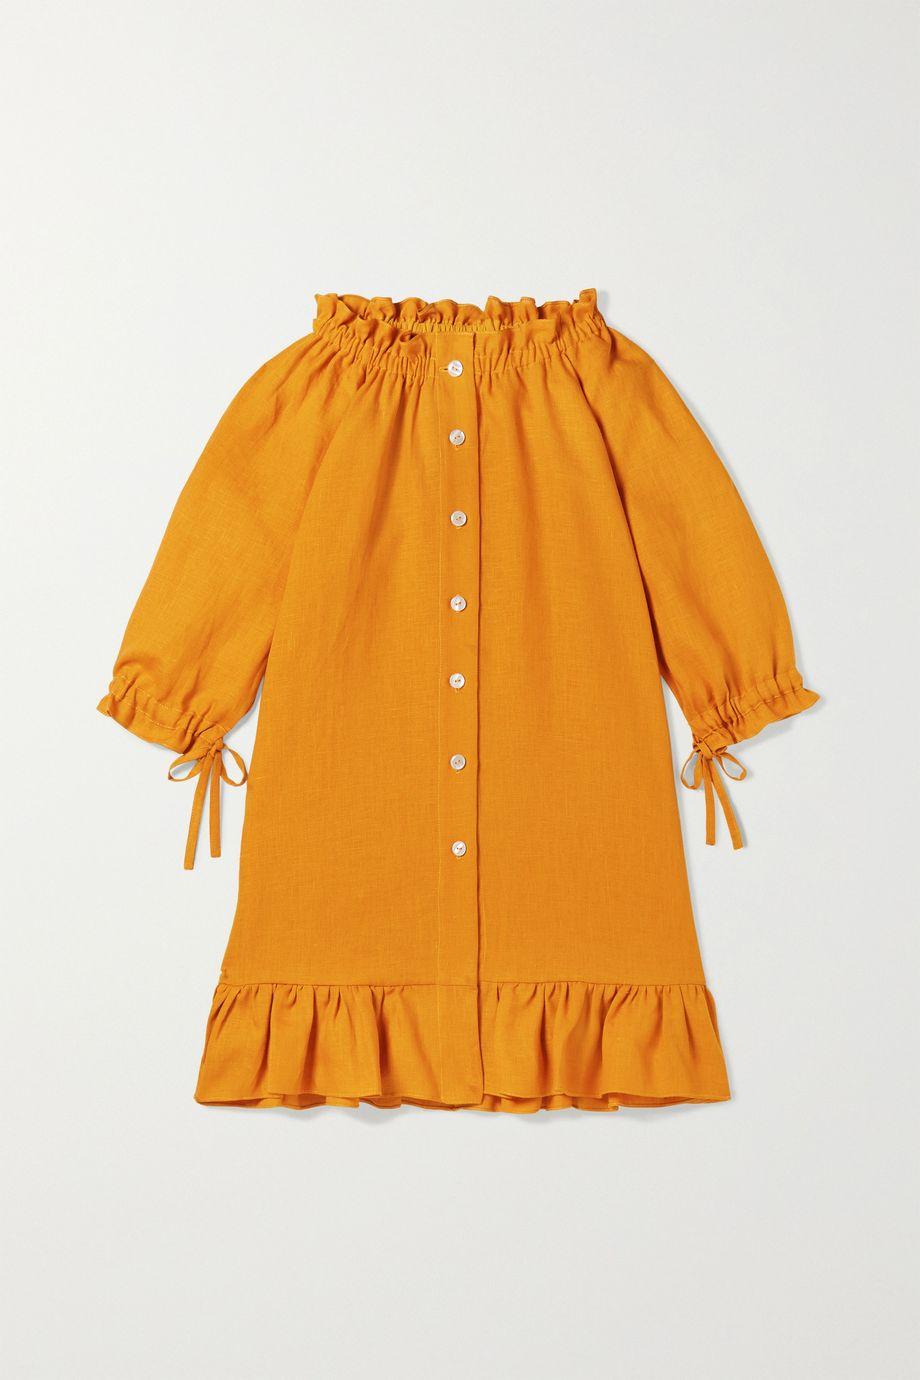 Sleeper Kids Ages 2 - 15 tie-detailed ruffled linen dress